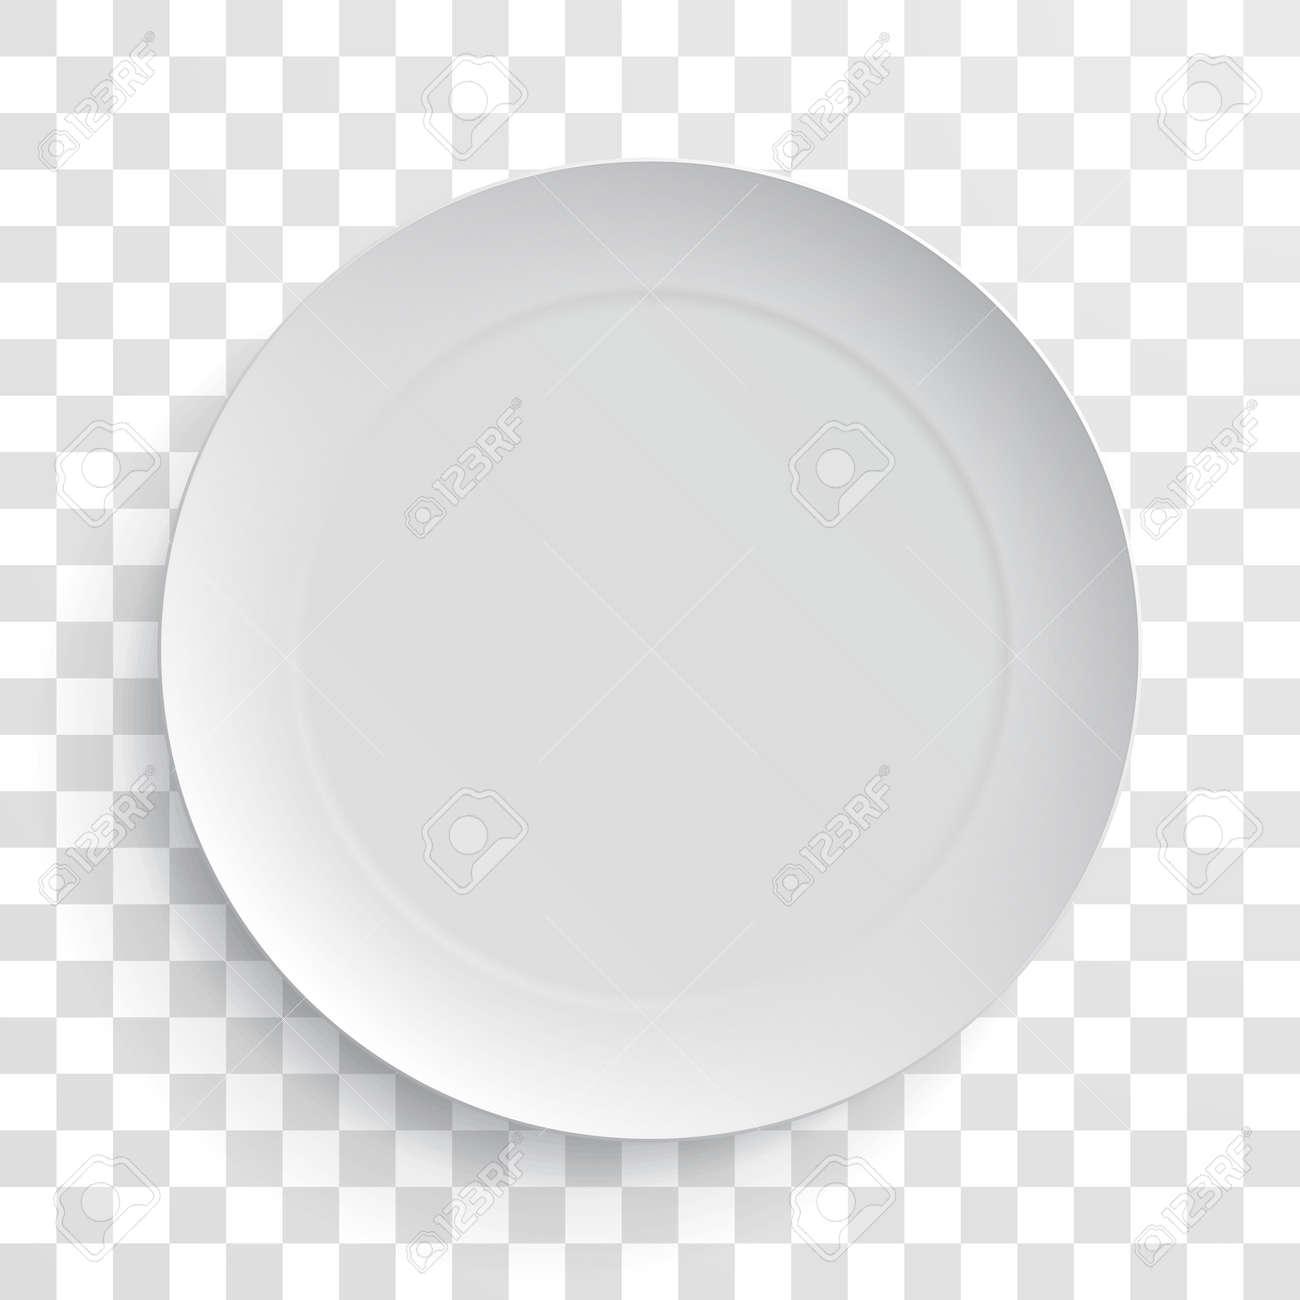 Empty white dish plate isolated 3d mockup model. Vector round porcelain, ceramic dinner plate. Illustration on transparent background - 63134823